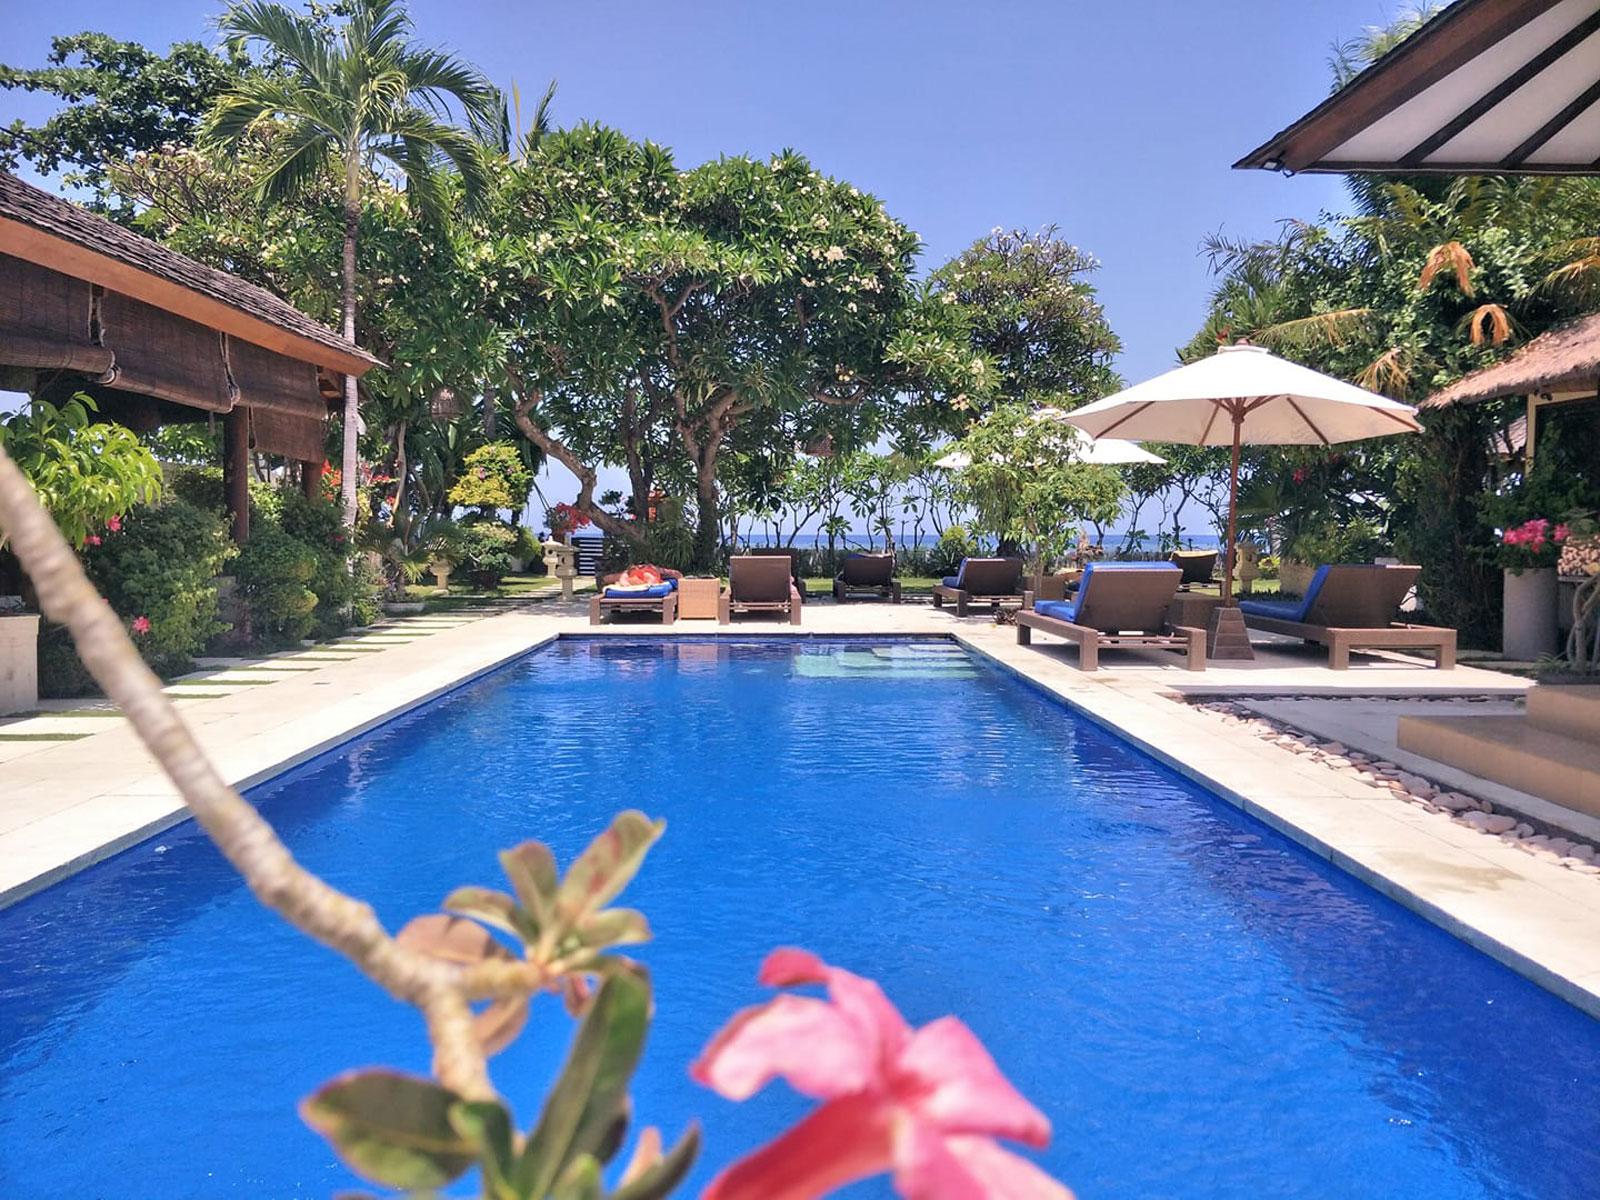 rondreis bali lovina frangipani beach hotel 1